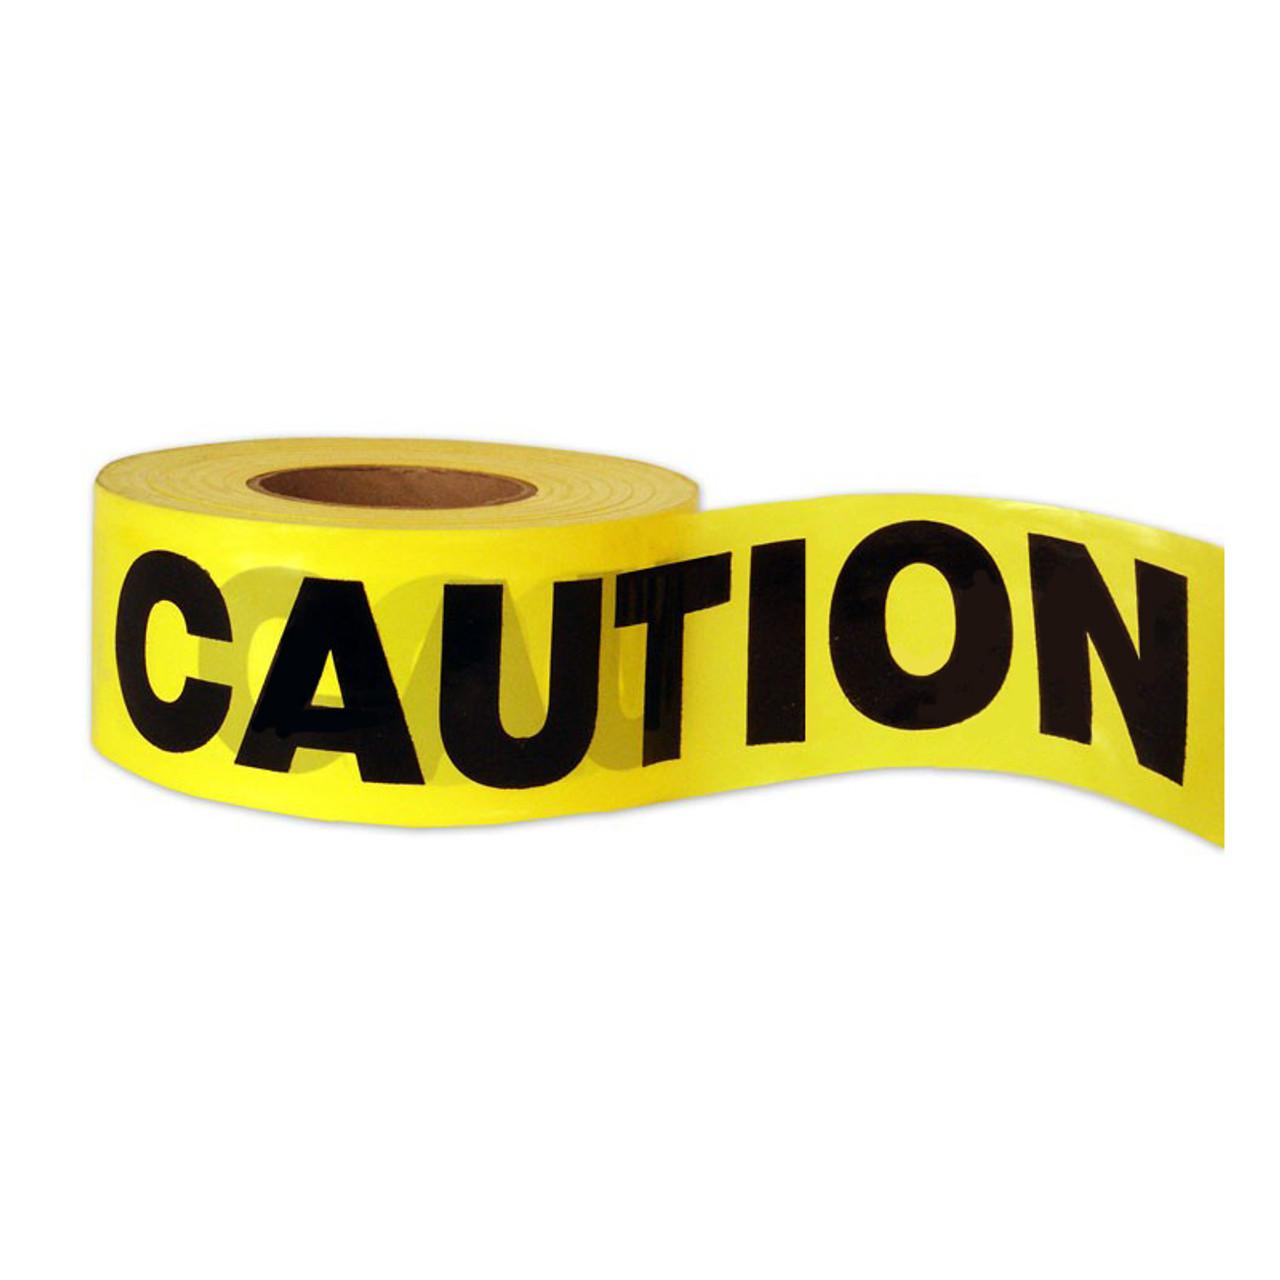 barricading tape - Jcmanagement.co